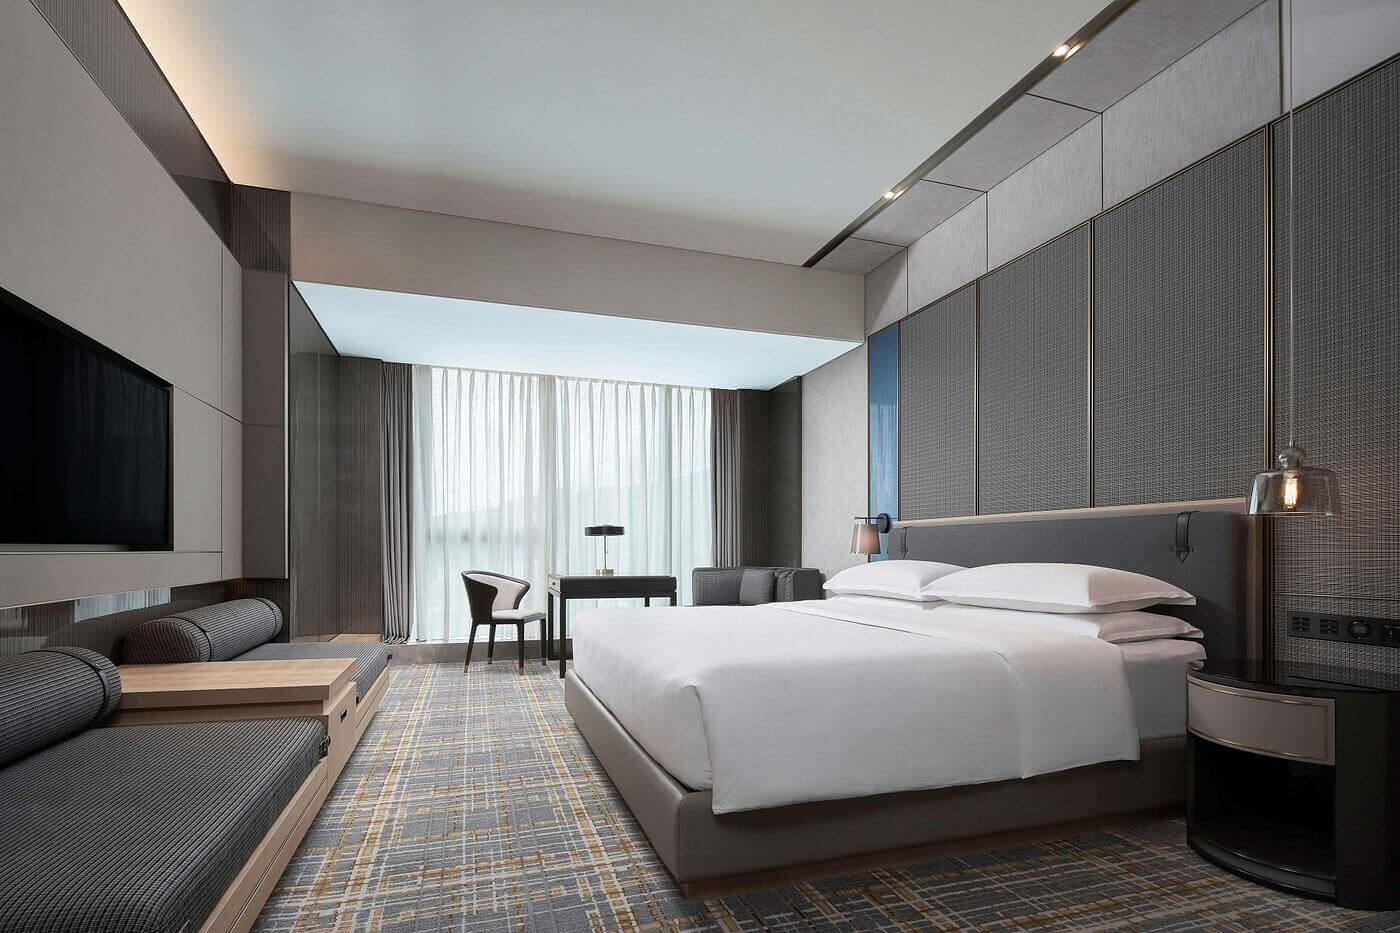 king-deluxe-guest-room